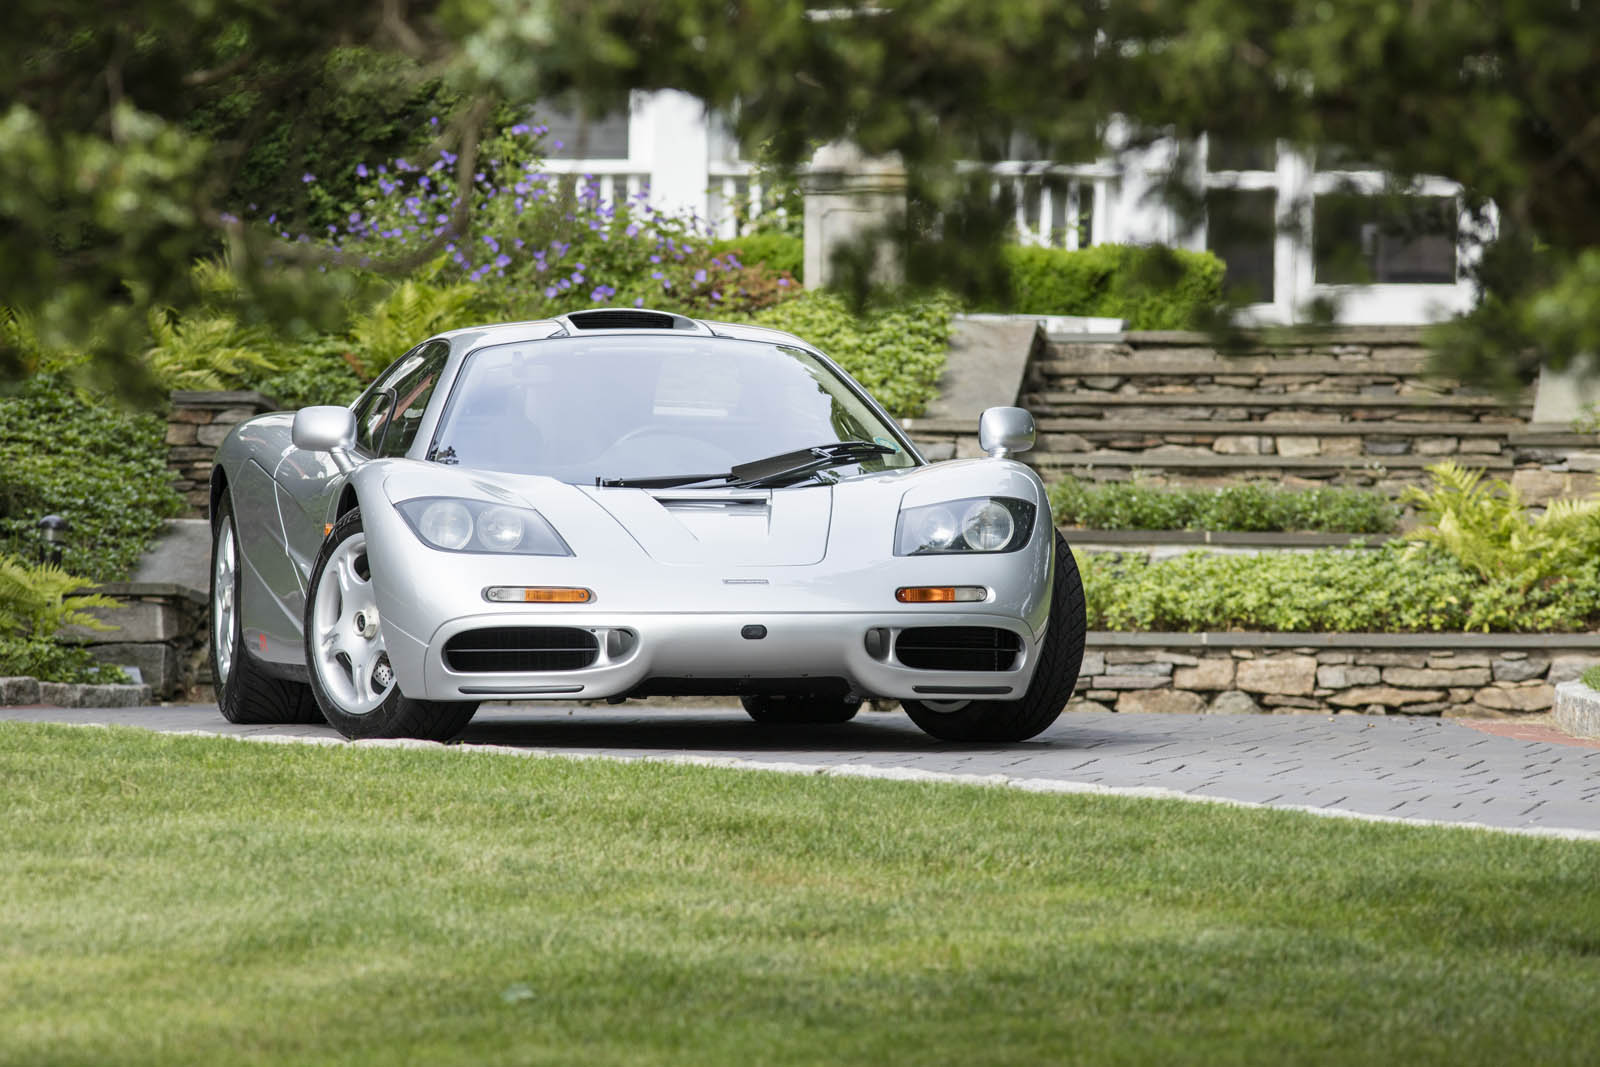 1995 McLaren F1 01 copy